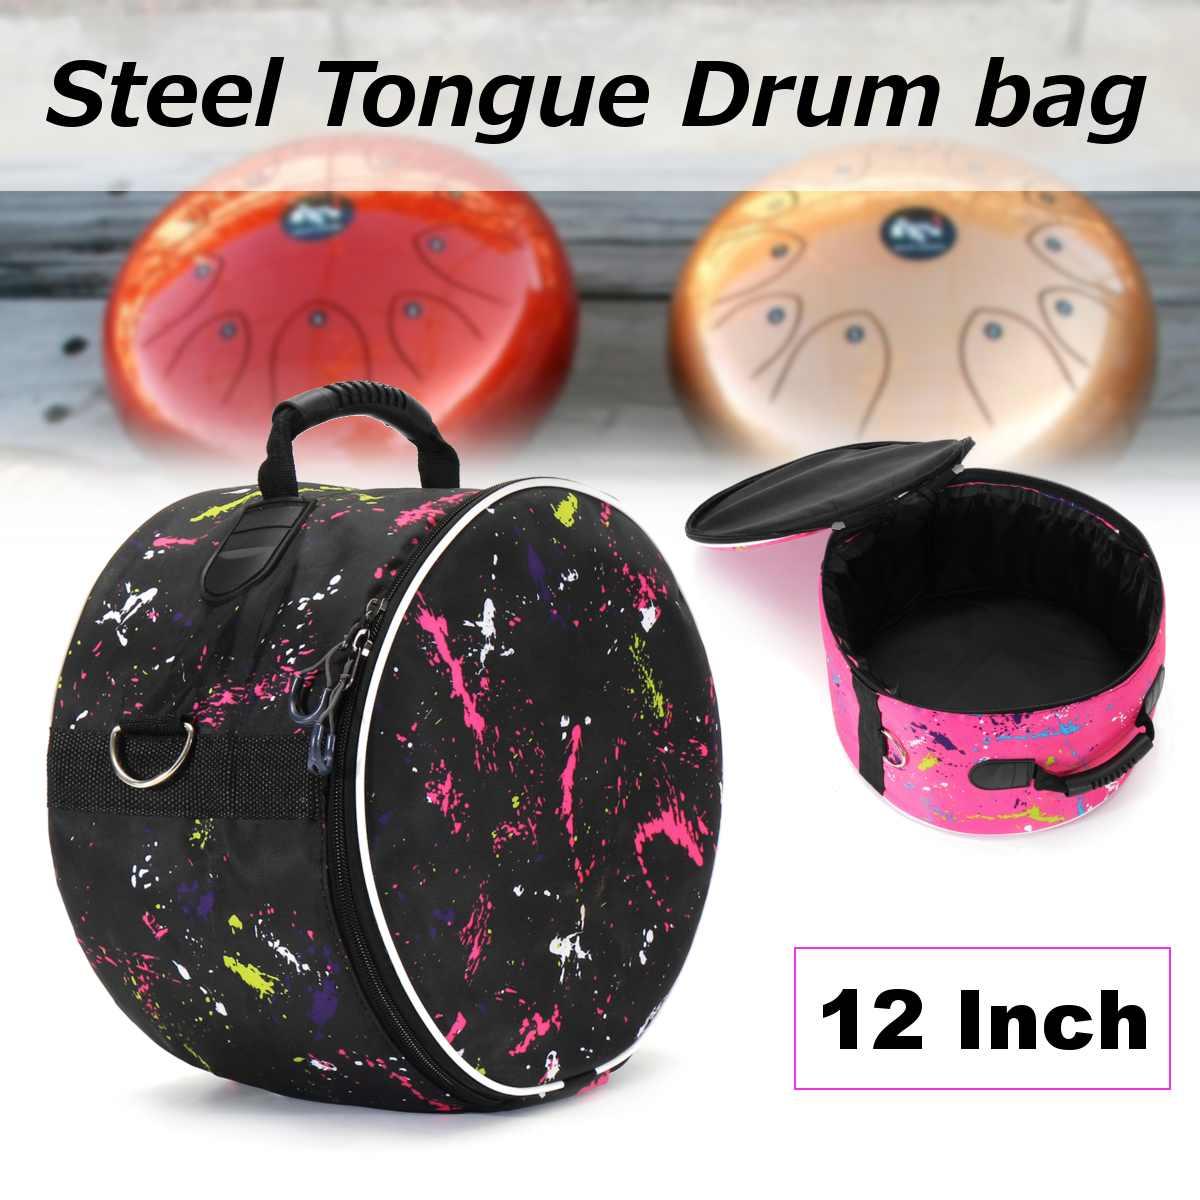 buy 12 inch durable portable steel tongue drum bag oxford fabric shoulder bag. Black Bedroom Furniture Sets. Home Design Ideas